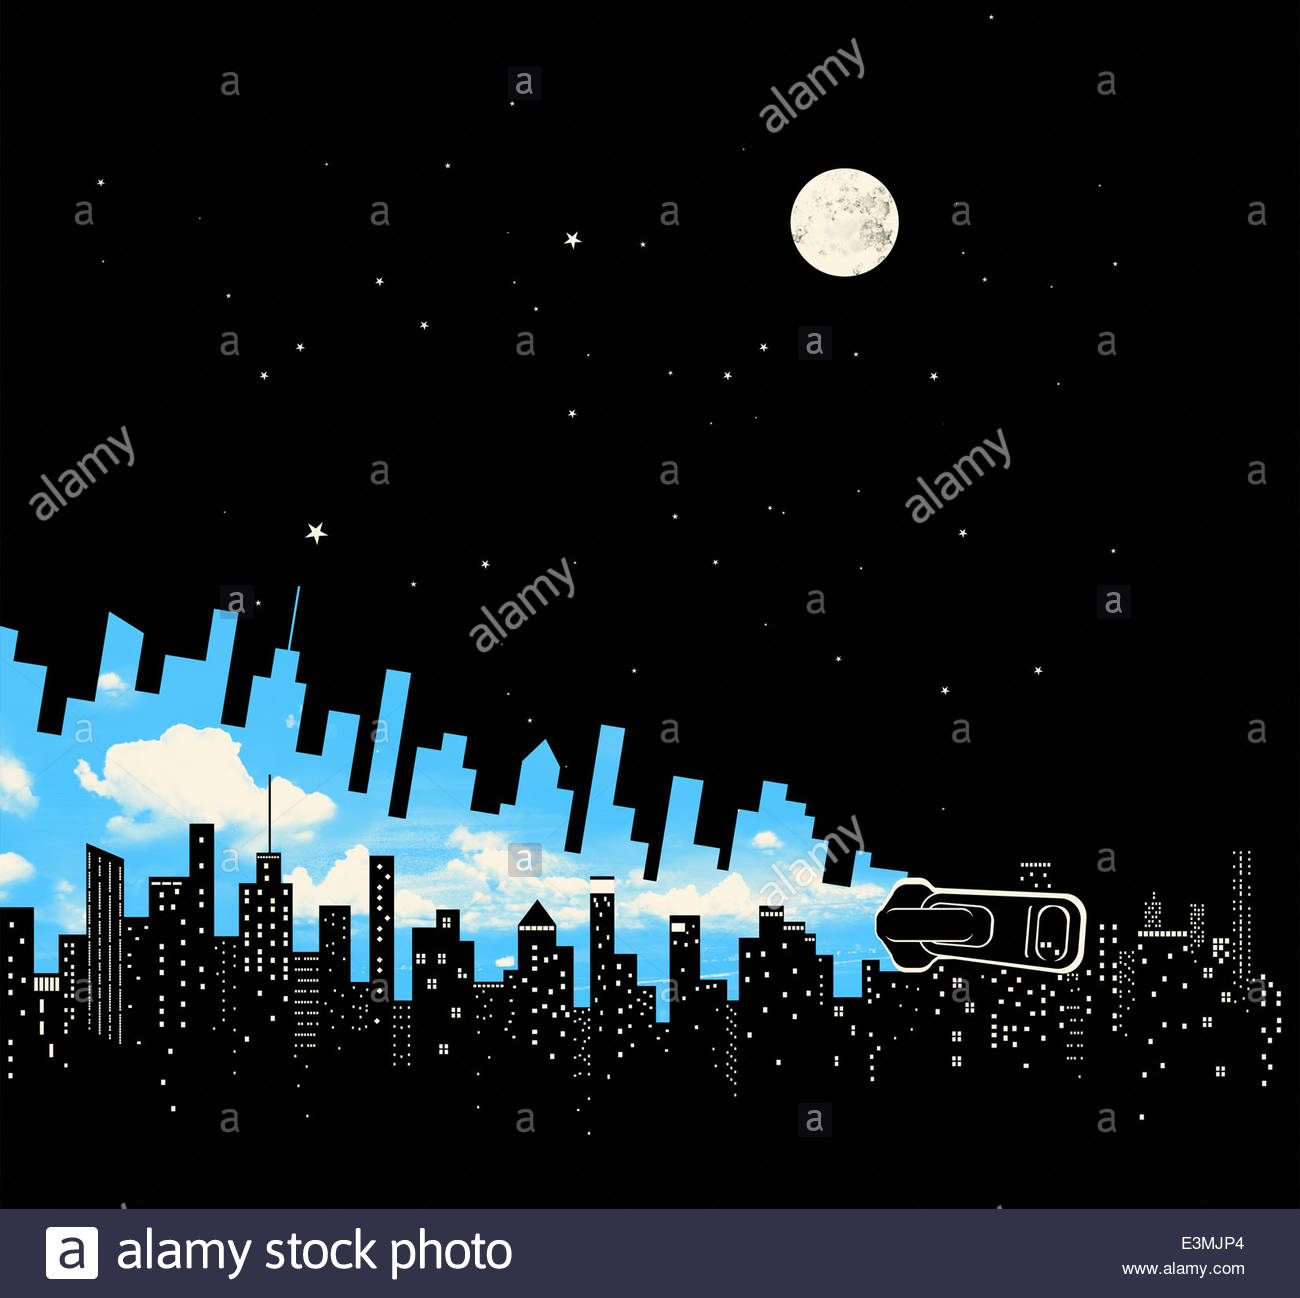 Zipper changing city skyline from dark night into blue sky day - Stock Image